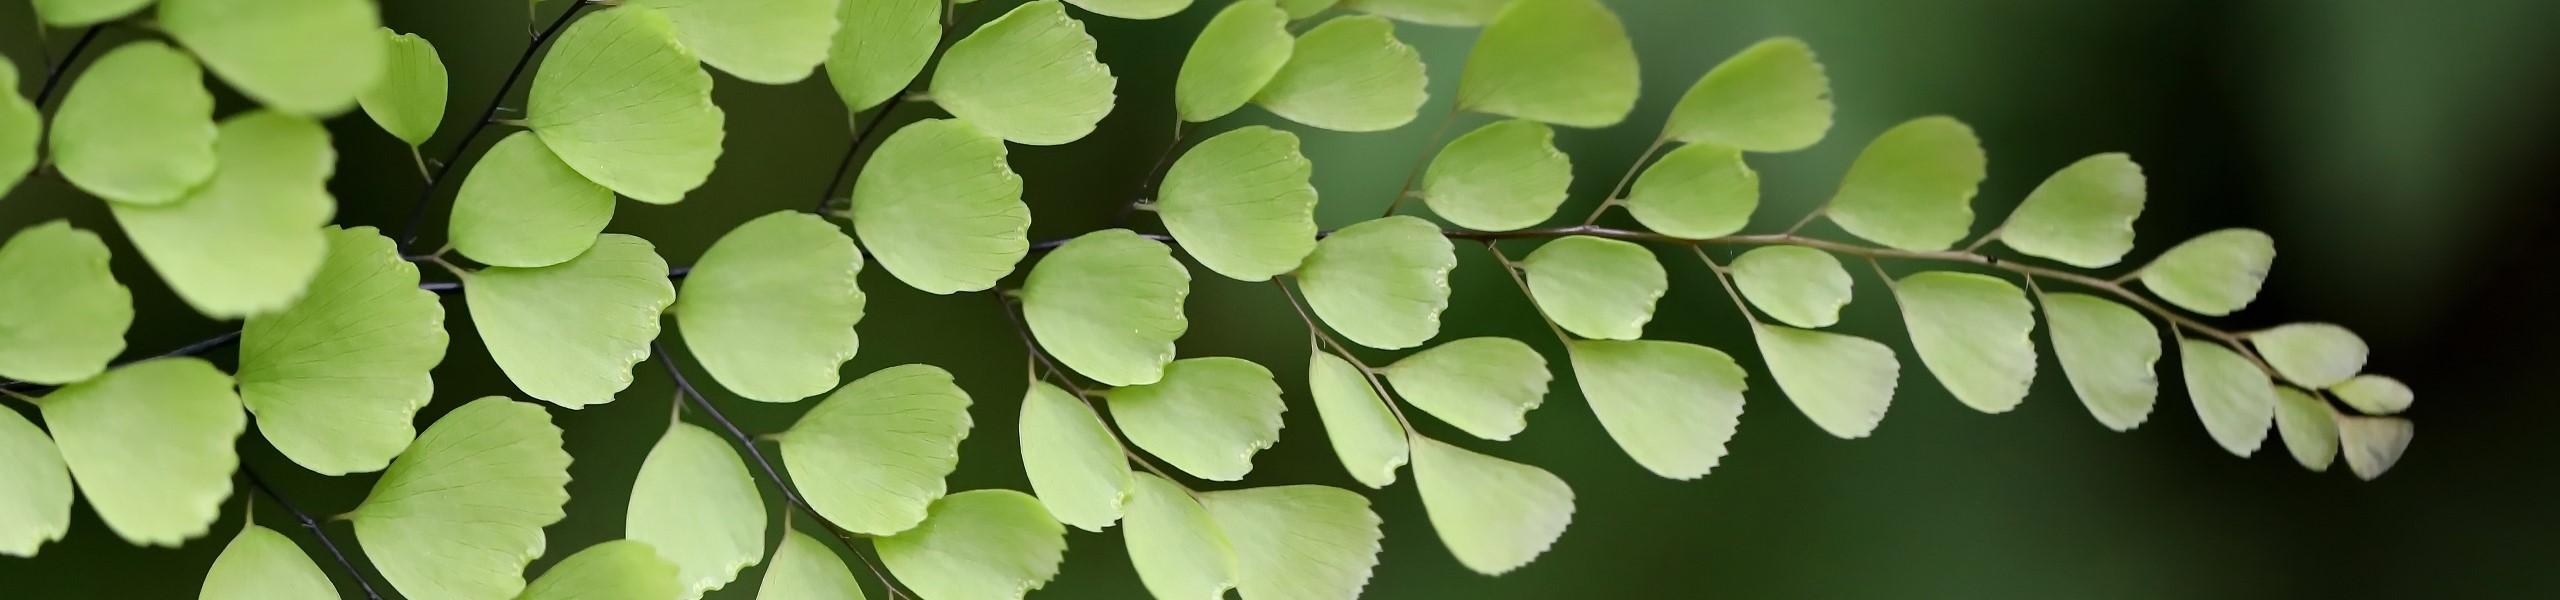 Ask an Expert! Fantastic Ferns at Hoyt Arboretum